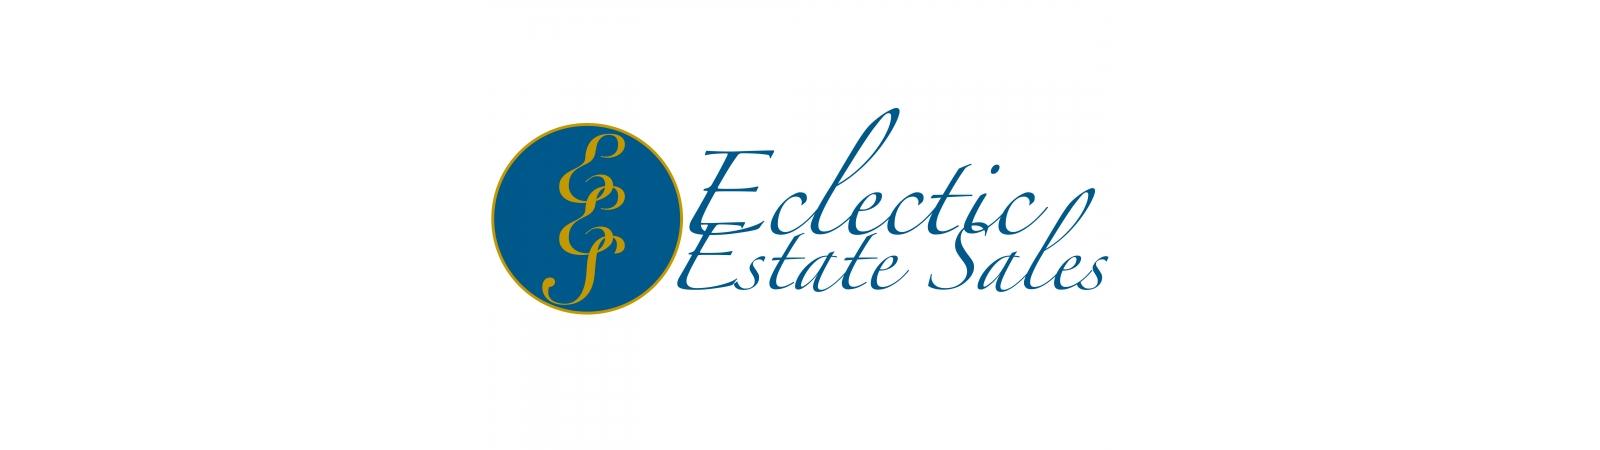 Eclectic Estate Sales   Auction Ninja